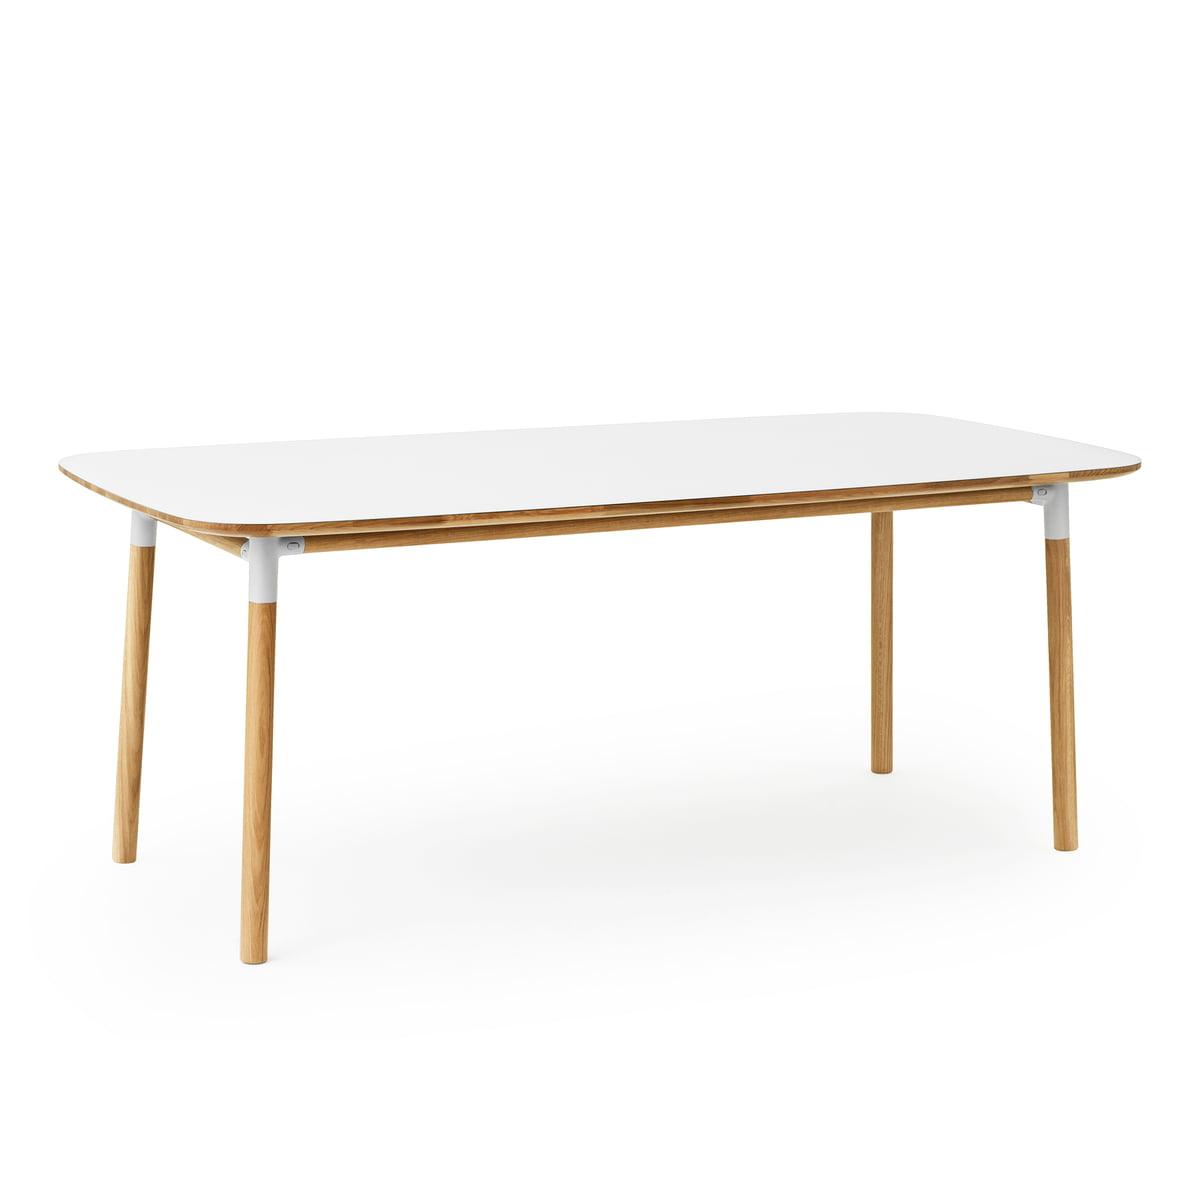 Wunderbar Form Table 95 X 200 Cm By Normann Copenhagen Made Of Oak In White